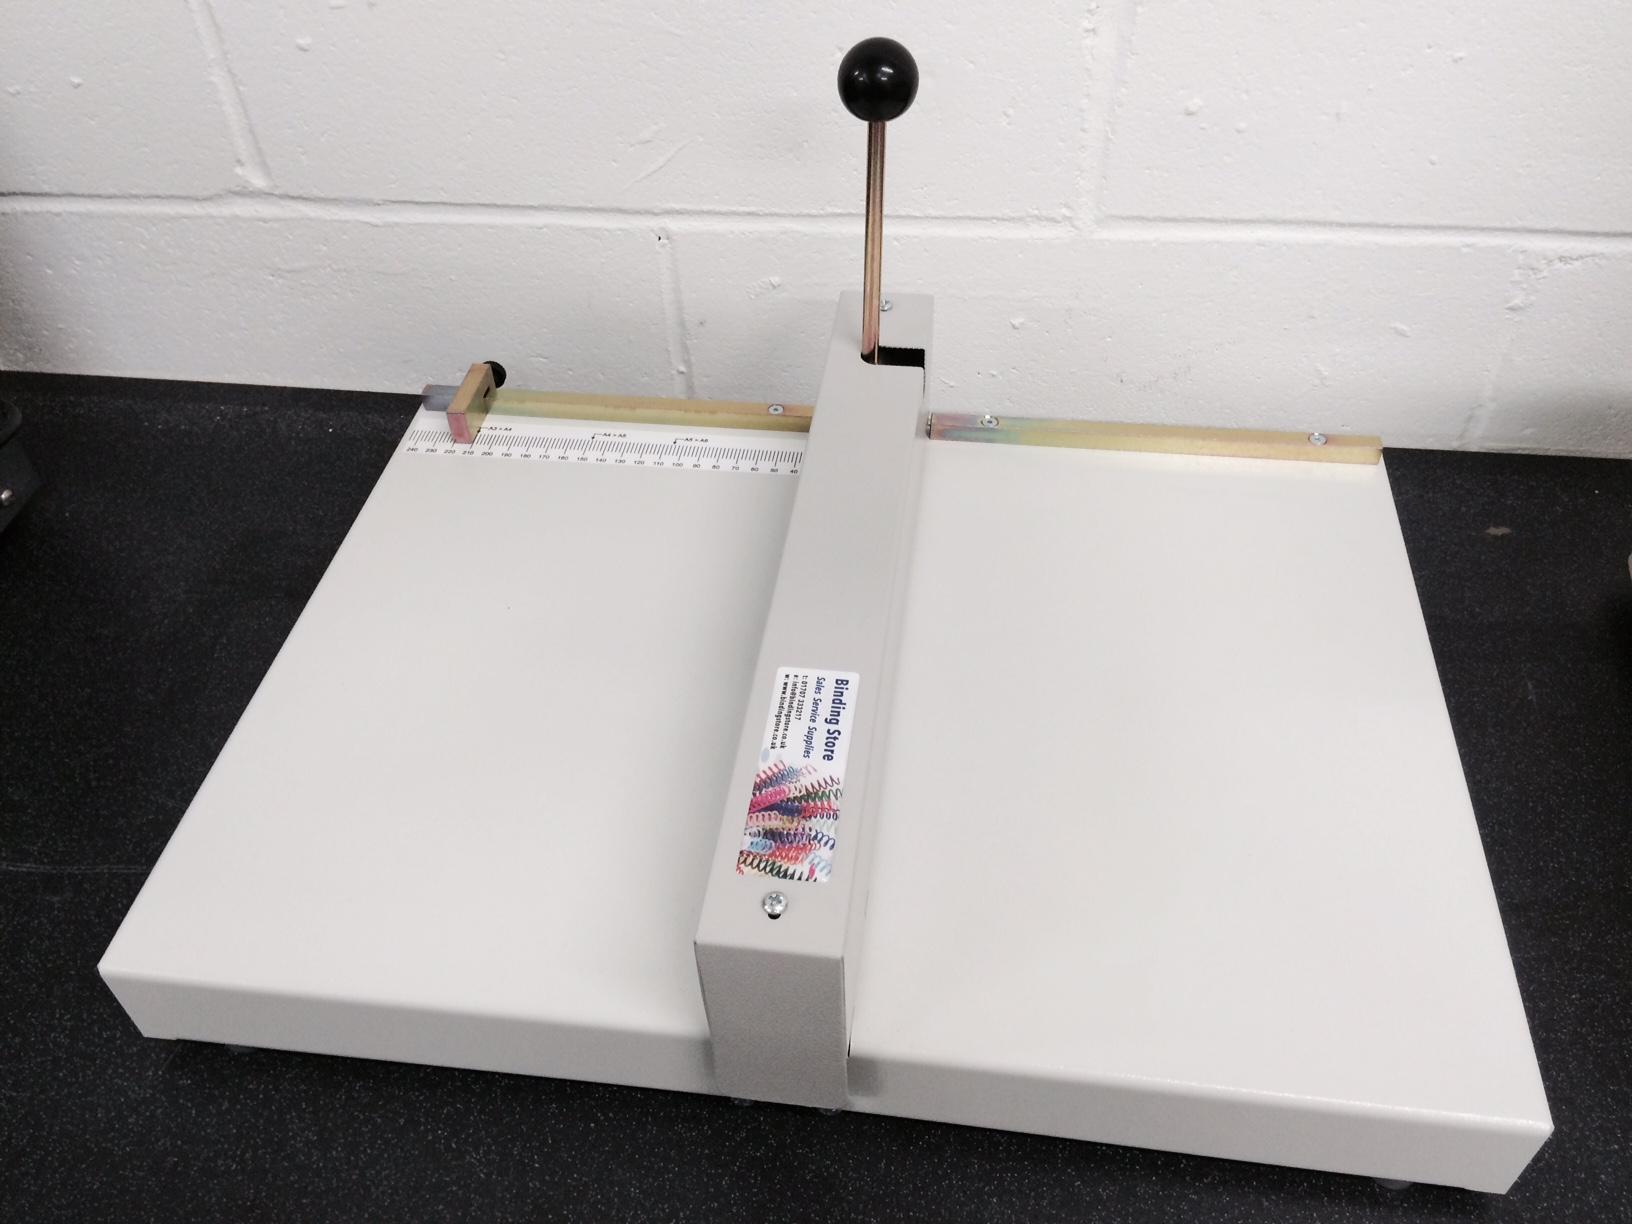 oslo mc 200 manual a3 paper card creasing machine. Black Bedroom Furniture Sets. Home Design Ideas